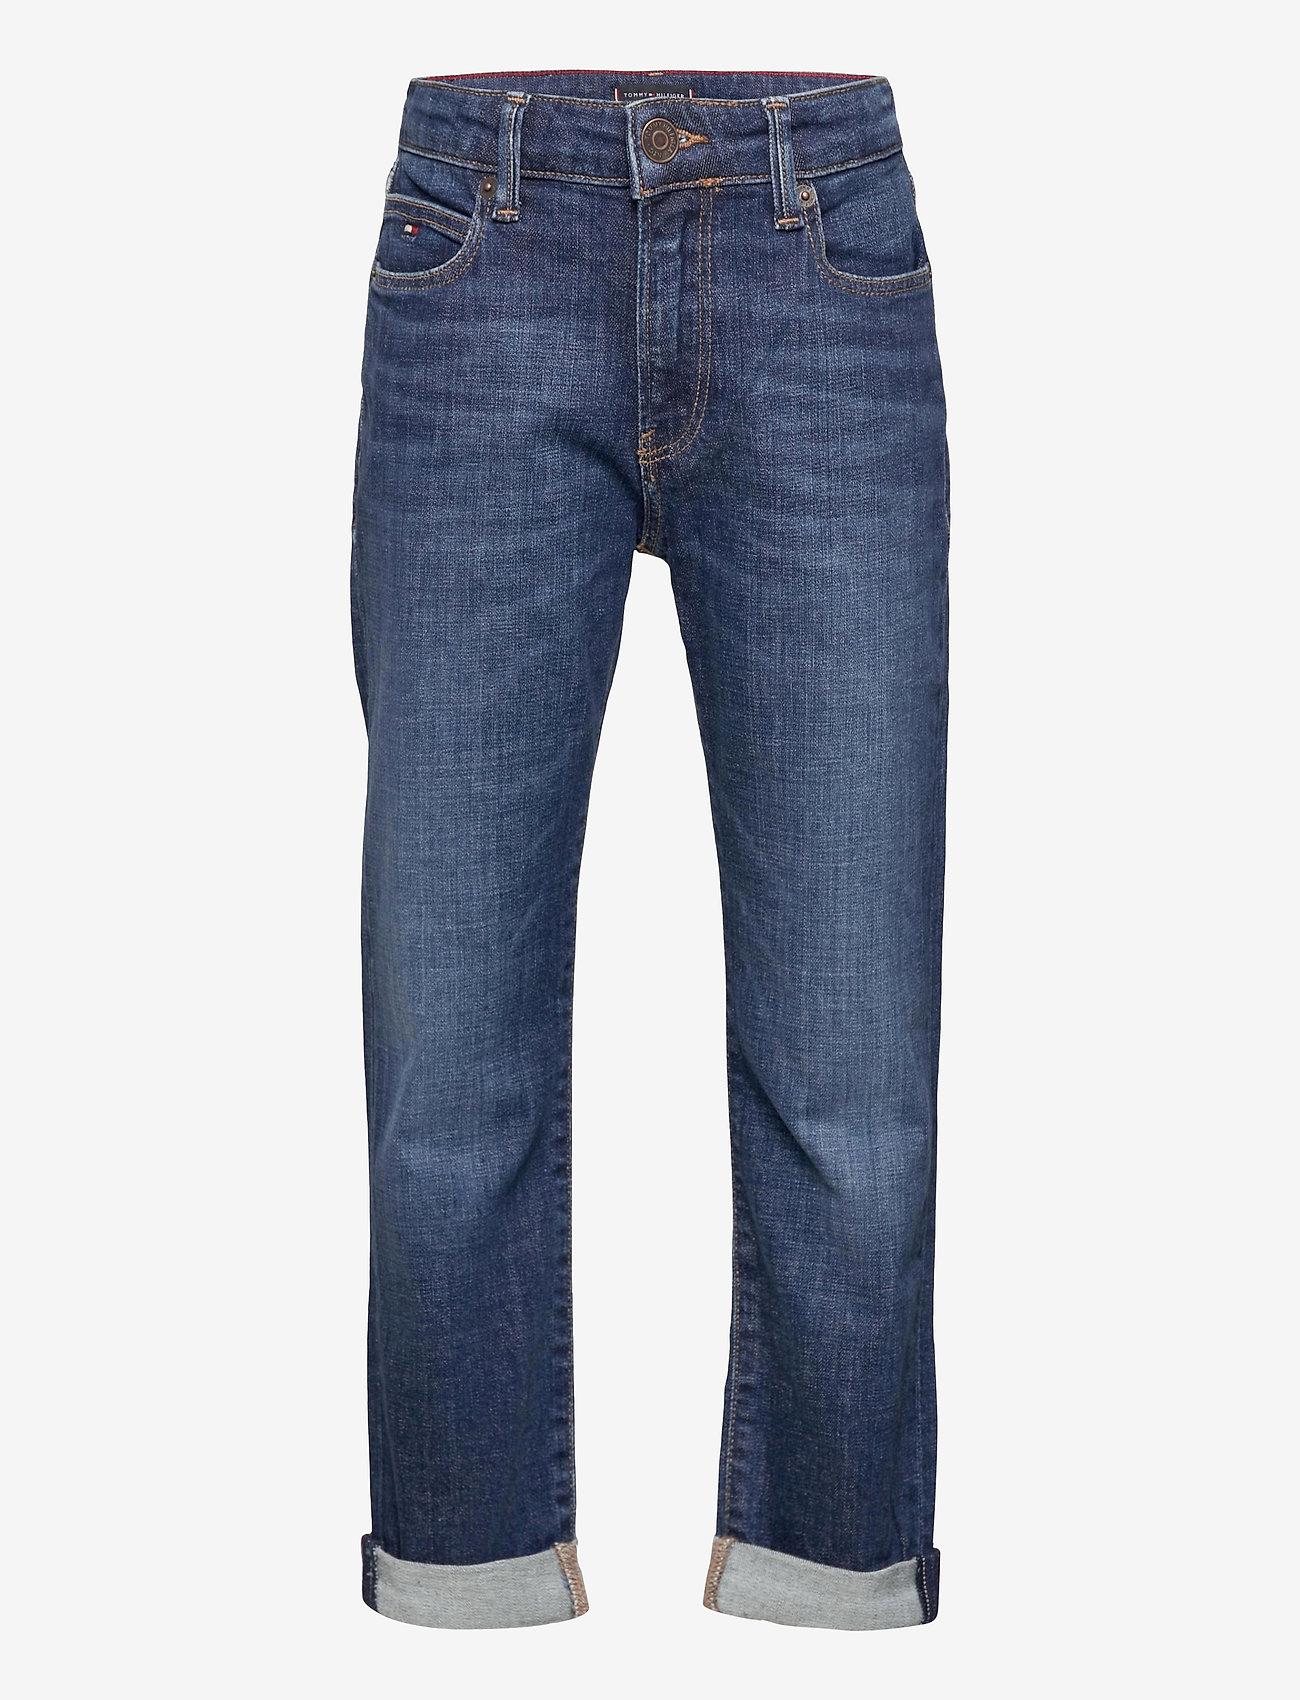 Tommy Hilfiger - MODERN STRAIGHT - jeans - summerdkbluestretch - 0